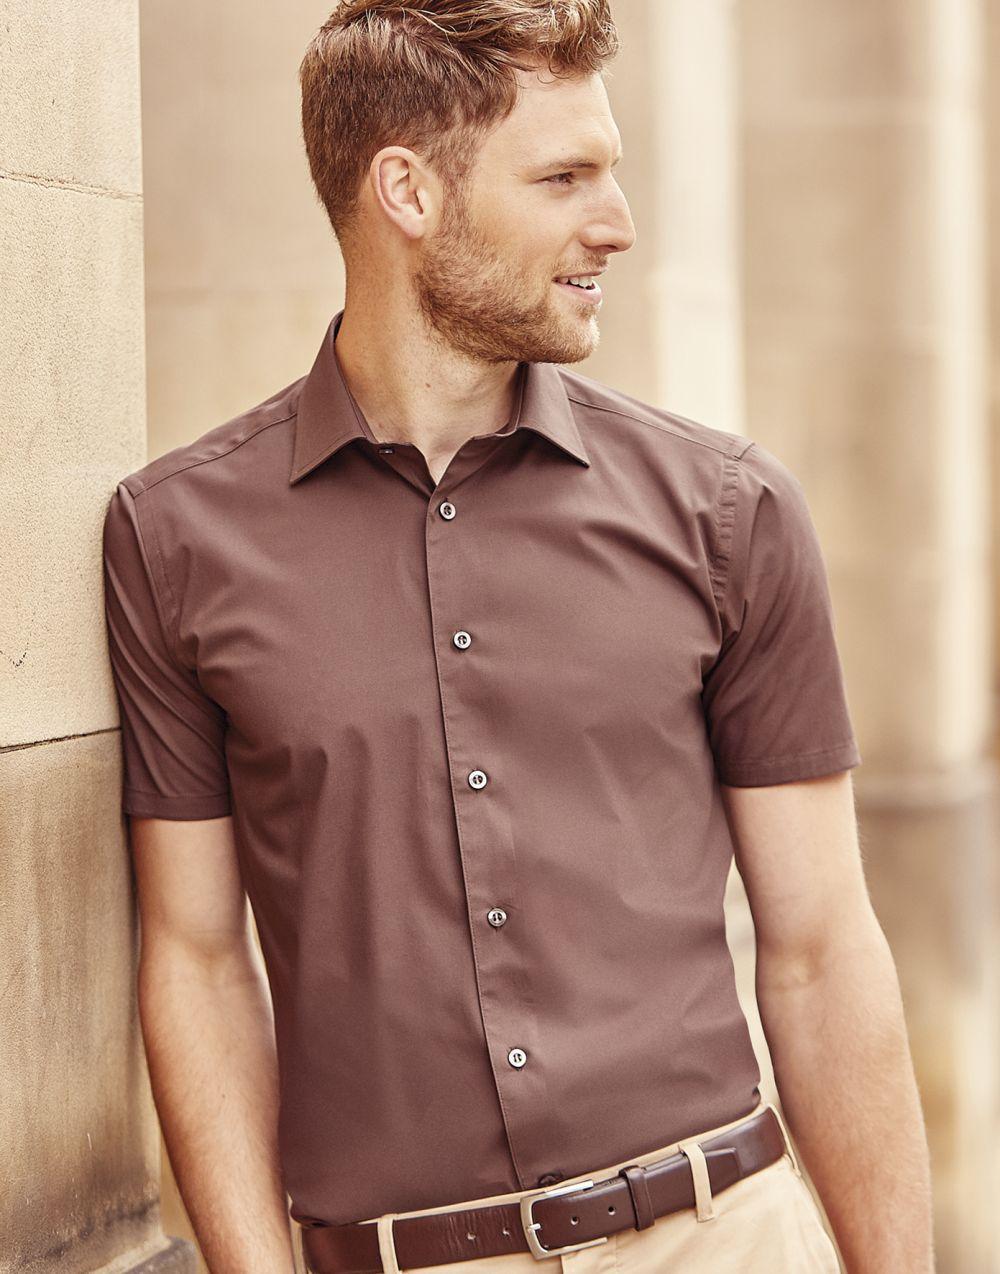 Camisas manga corta russell entallada manga corta para personalizar vista 4